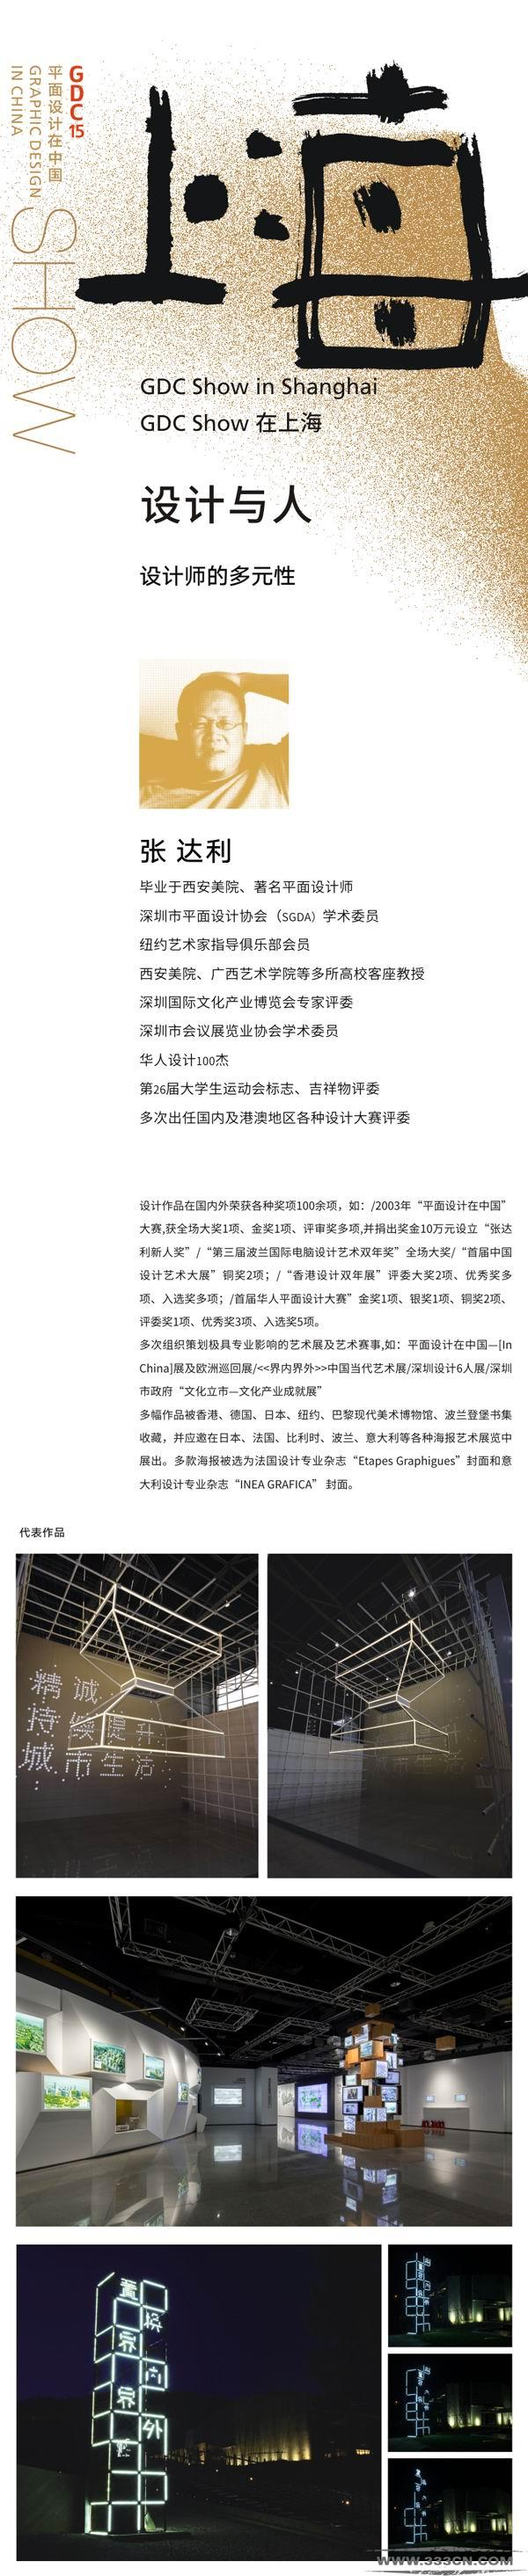 GDC Show 在上海 设计与我 平面设计在中国